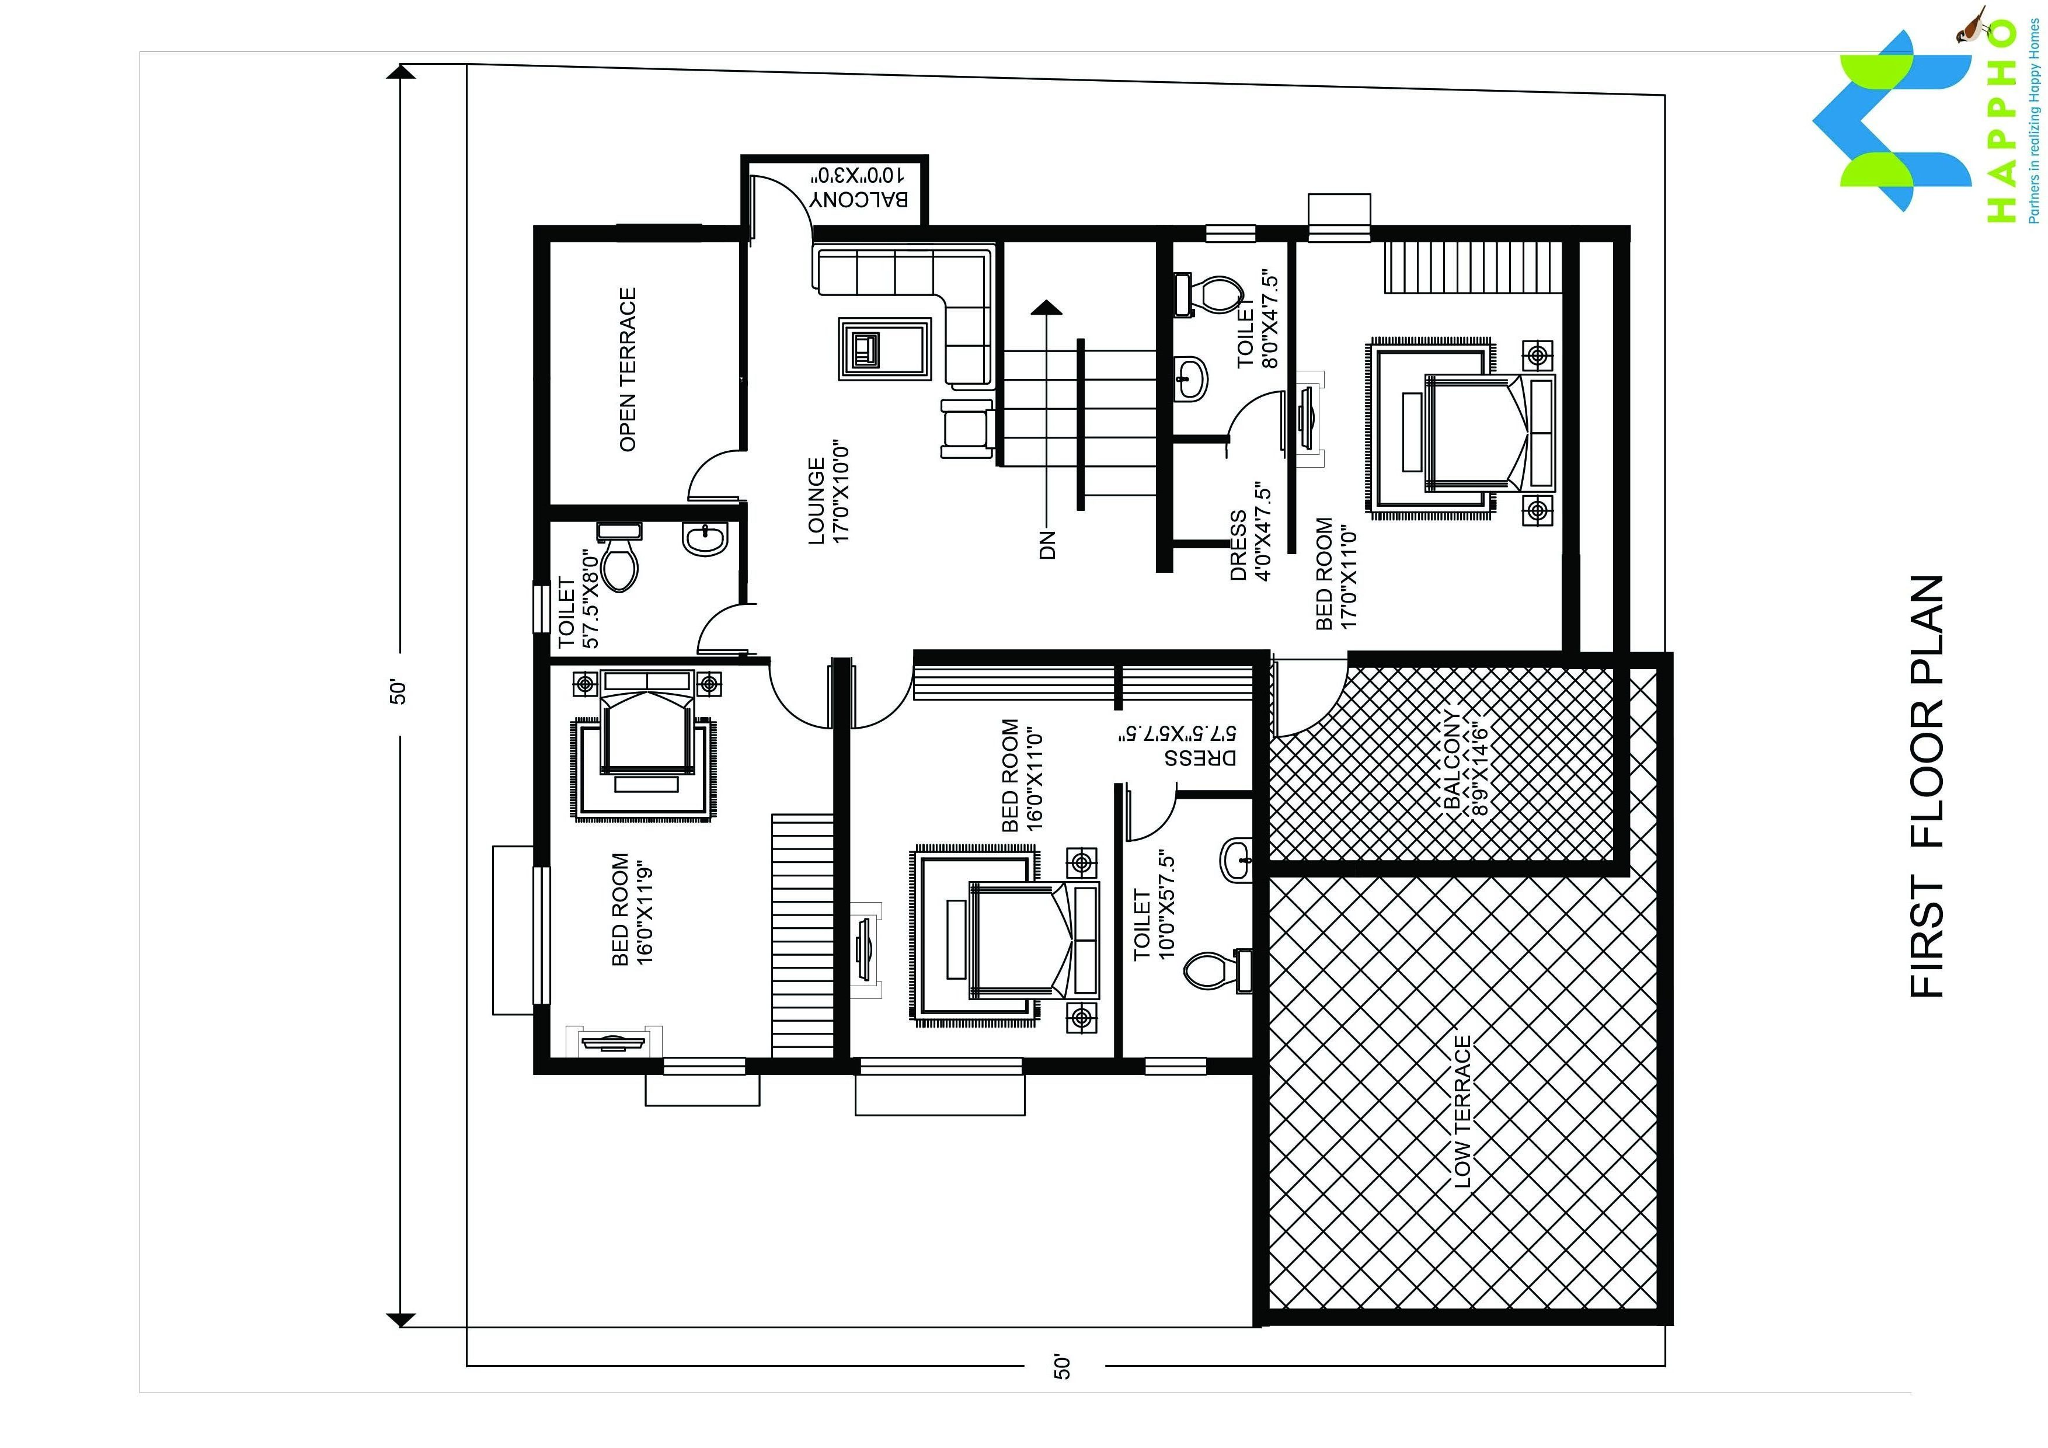 5-BHK Floor Plan for 25 X 25 Feet plot (2500 Square Feet) on 28 x 40 home plans, 28 x 50 house plans, 40 x 50 house plans, barndominium floor plans, 40 by 40 house plans, 25 x 50 garage, 30 x 50 house plans, 50 x 50 house plans, 35 x 50 house plans, 50 x 100 house plans, 24 x 50 house plans, 25 x 60 house plans, 20 x 50 house plans, 25 x 30 house plans, 25 x 25 house plans, modern house plans, 26 x 50 house plans, 32 x 50 house plans, 25 x 36 house plans, 25 x 50 storage,